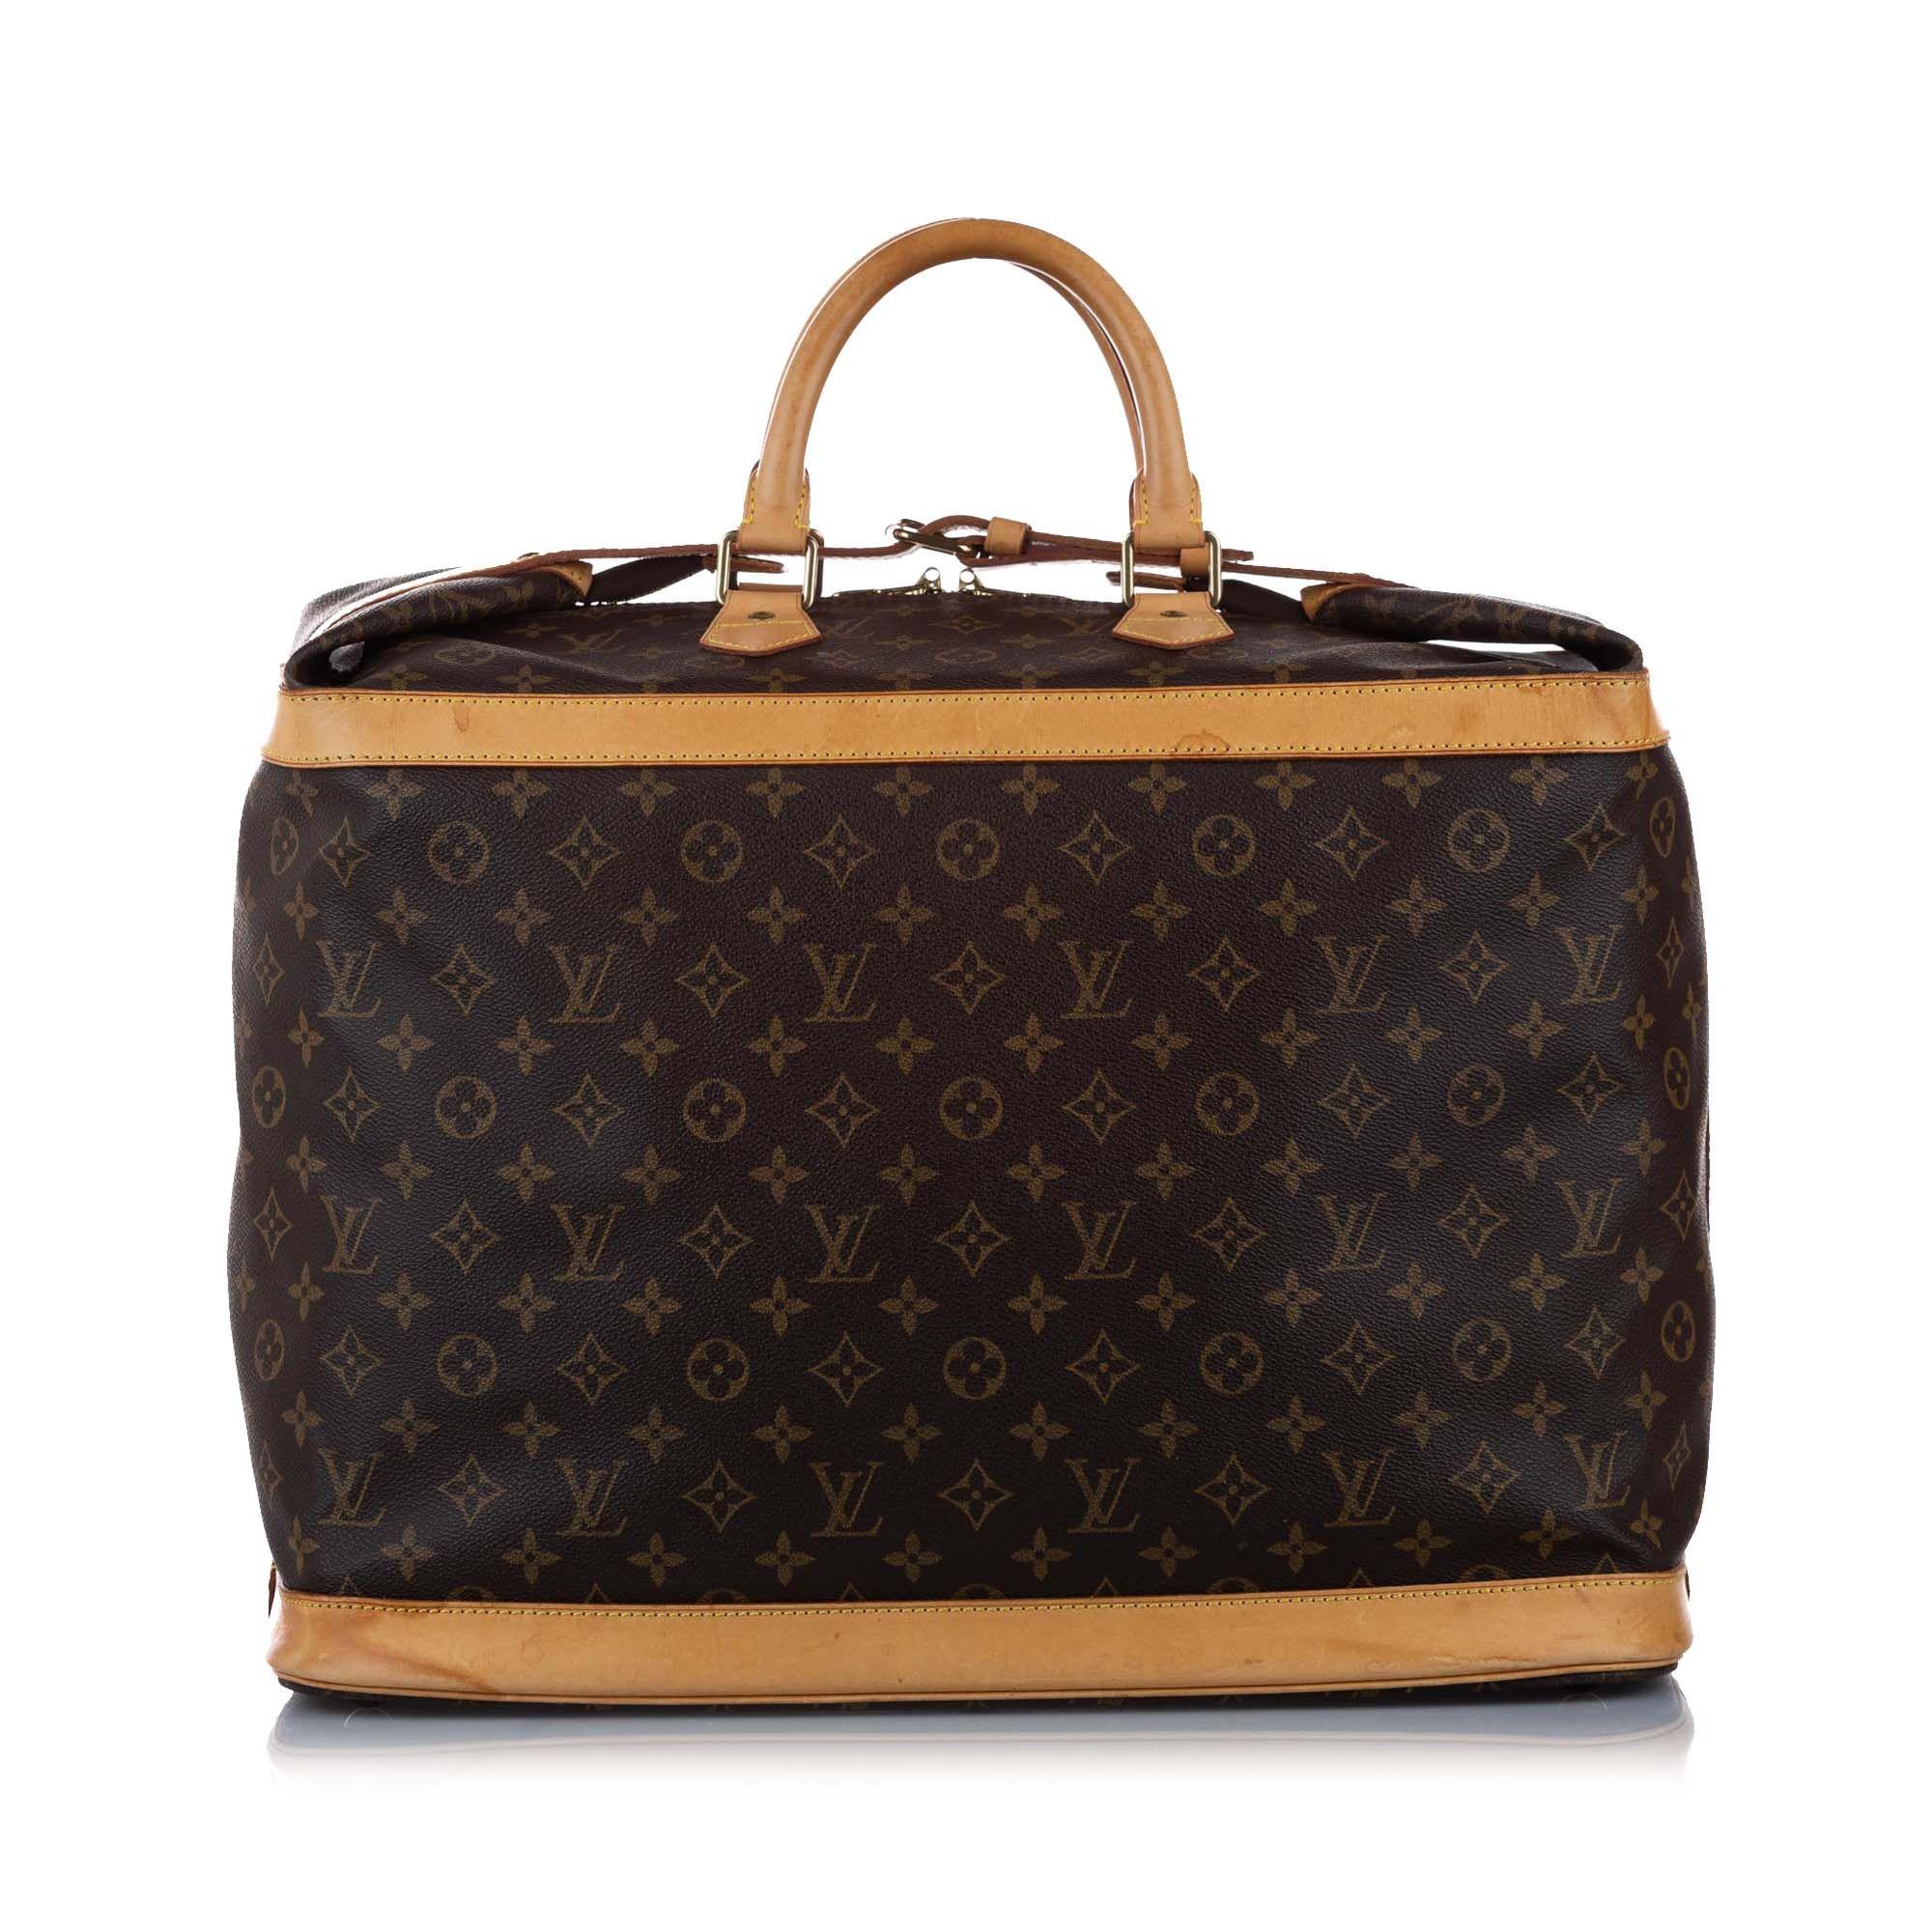 Vintage Louis Vuitton Monogram Cruiser 50 Brown